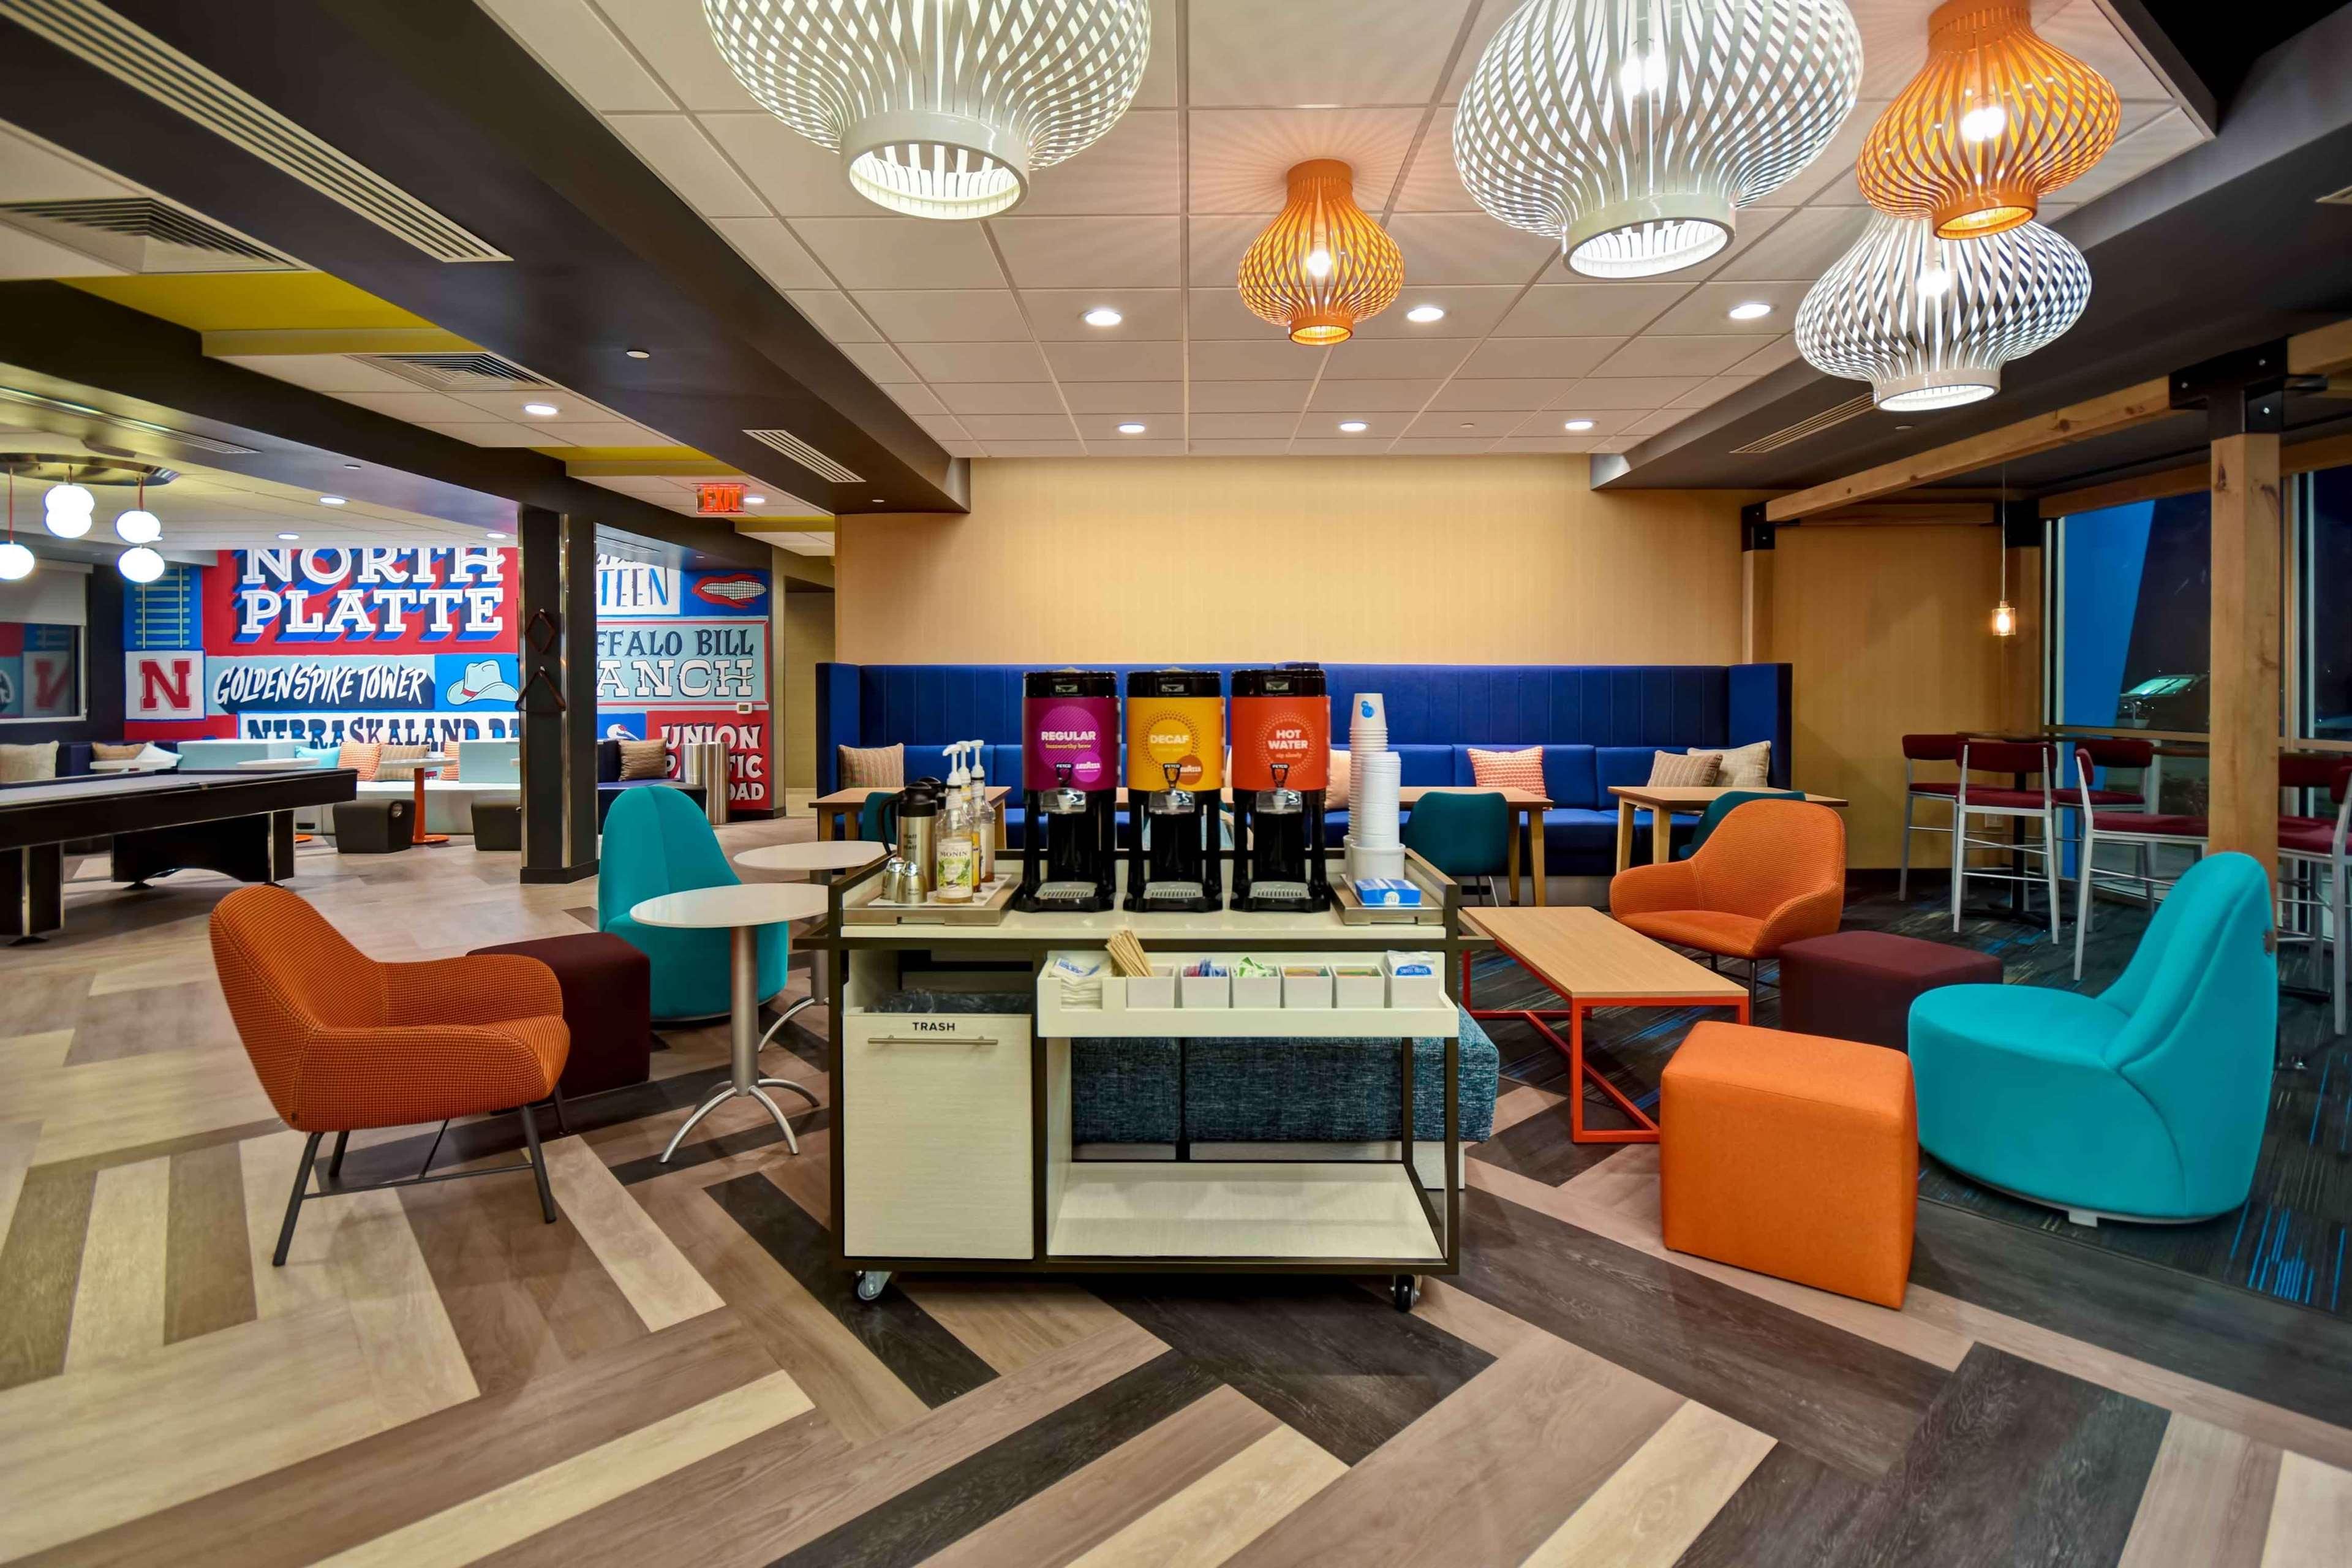 Tru by Hilton North Platte image 13